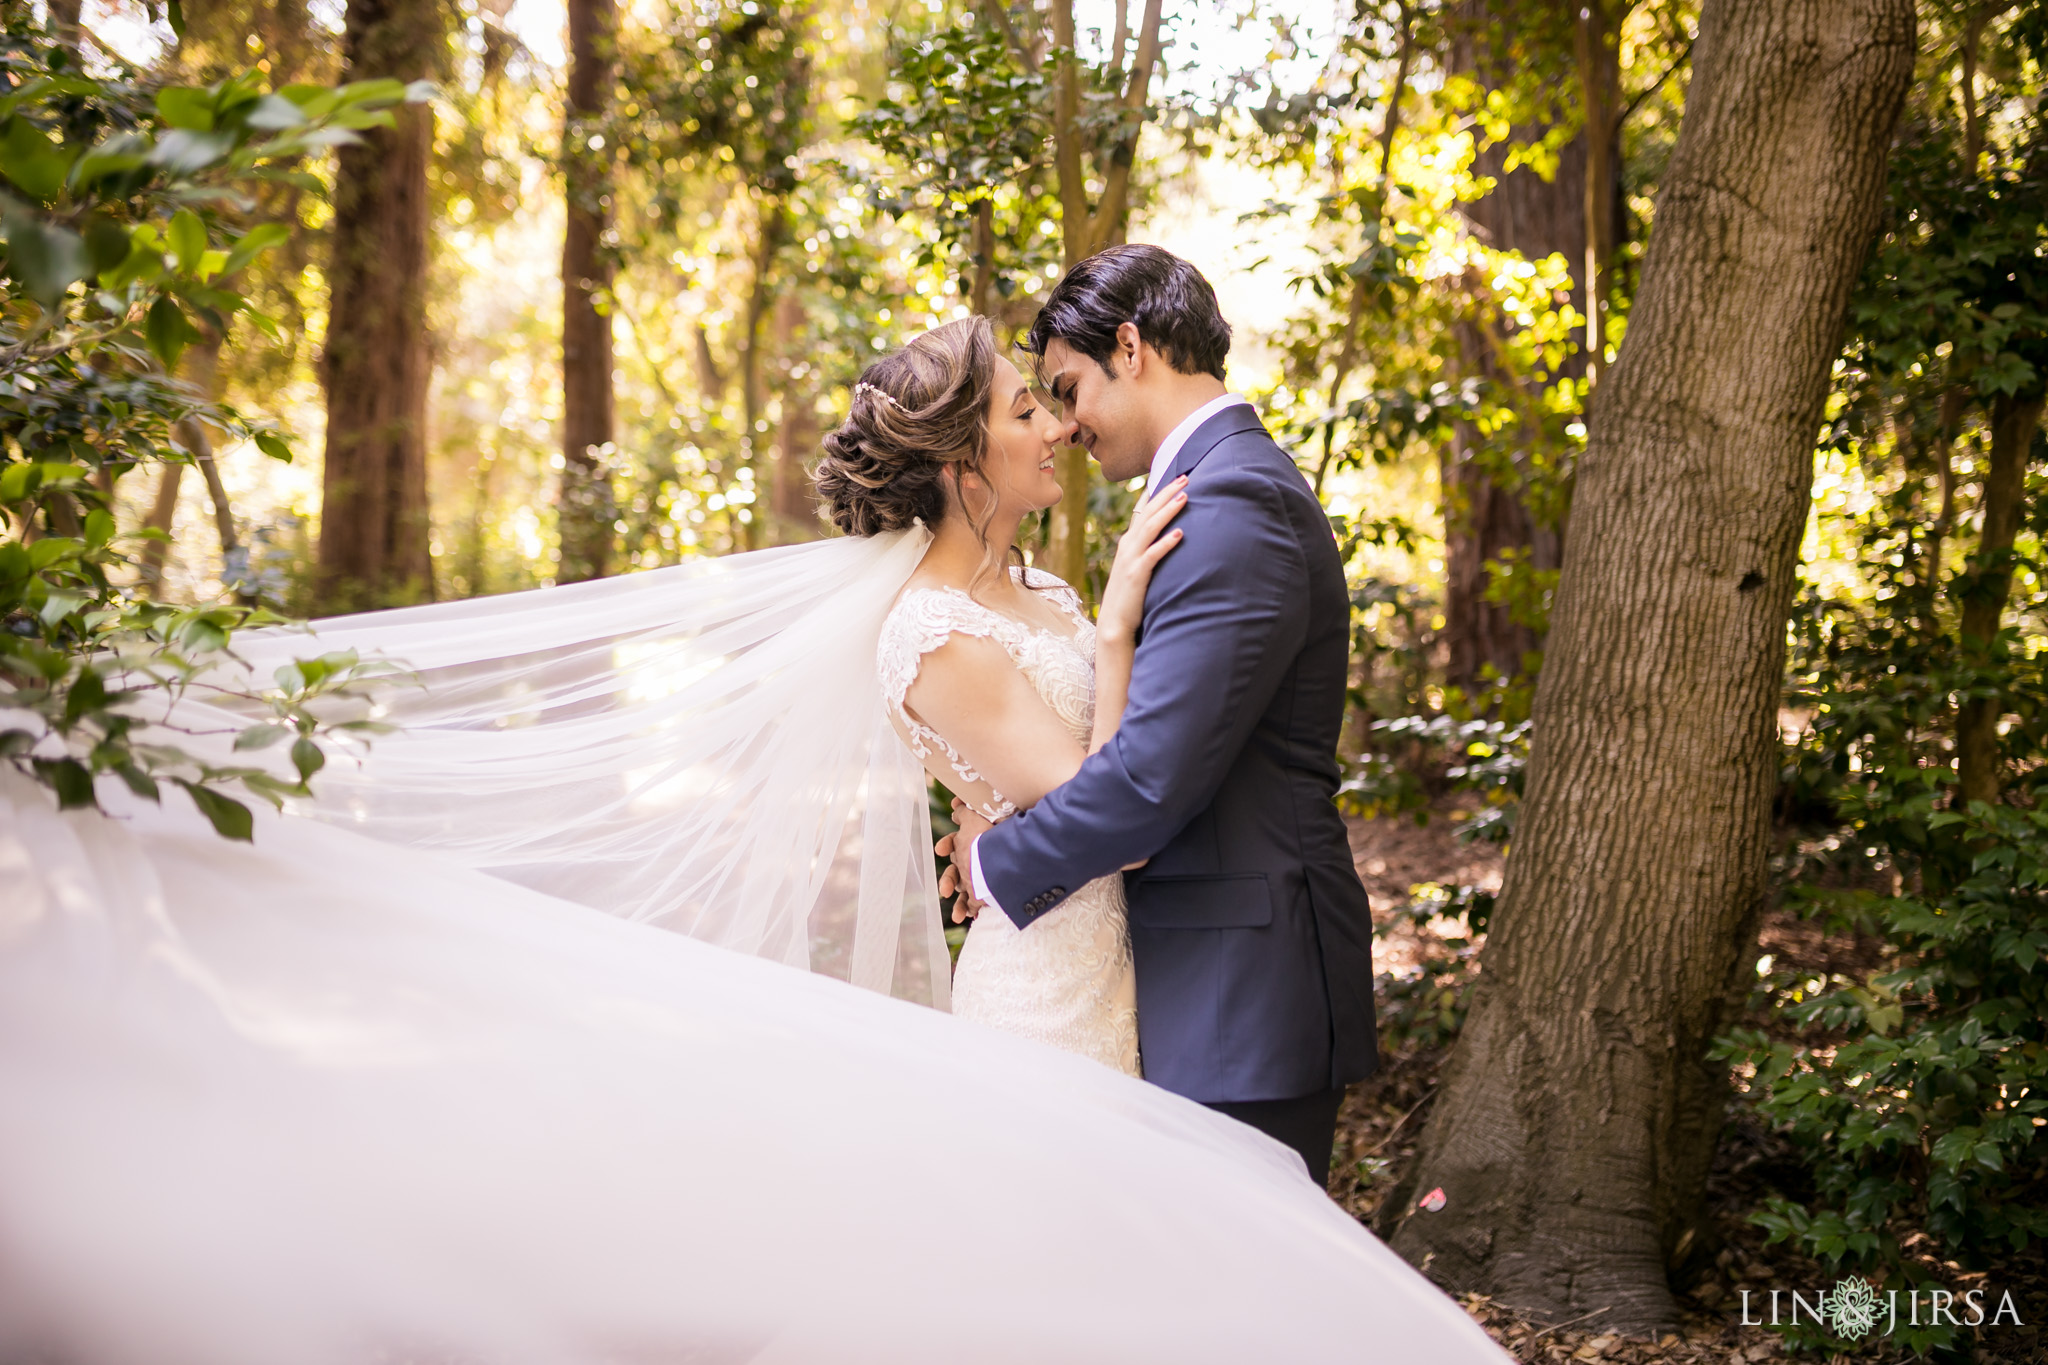 011 taglyan complex los angeles persian wedding photography